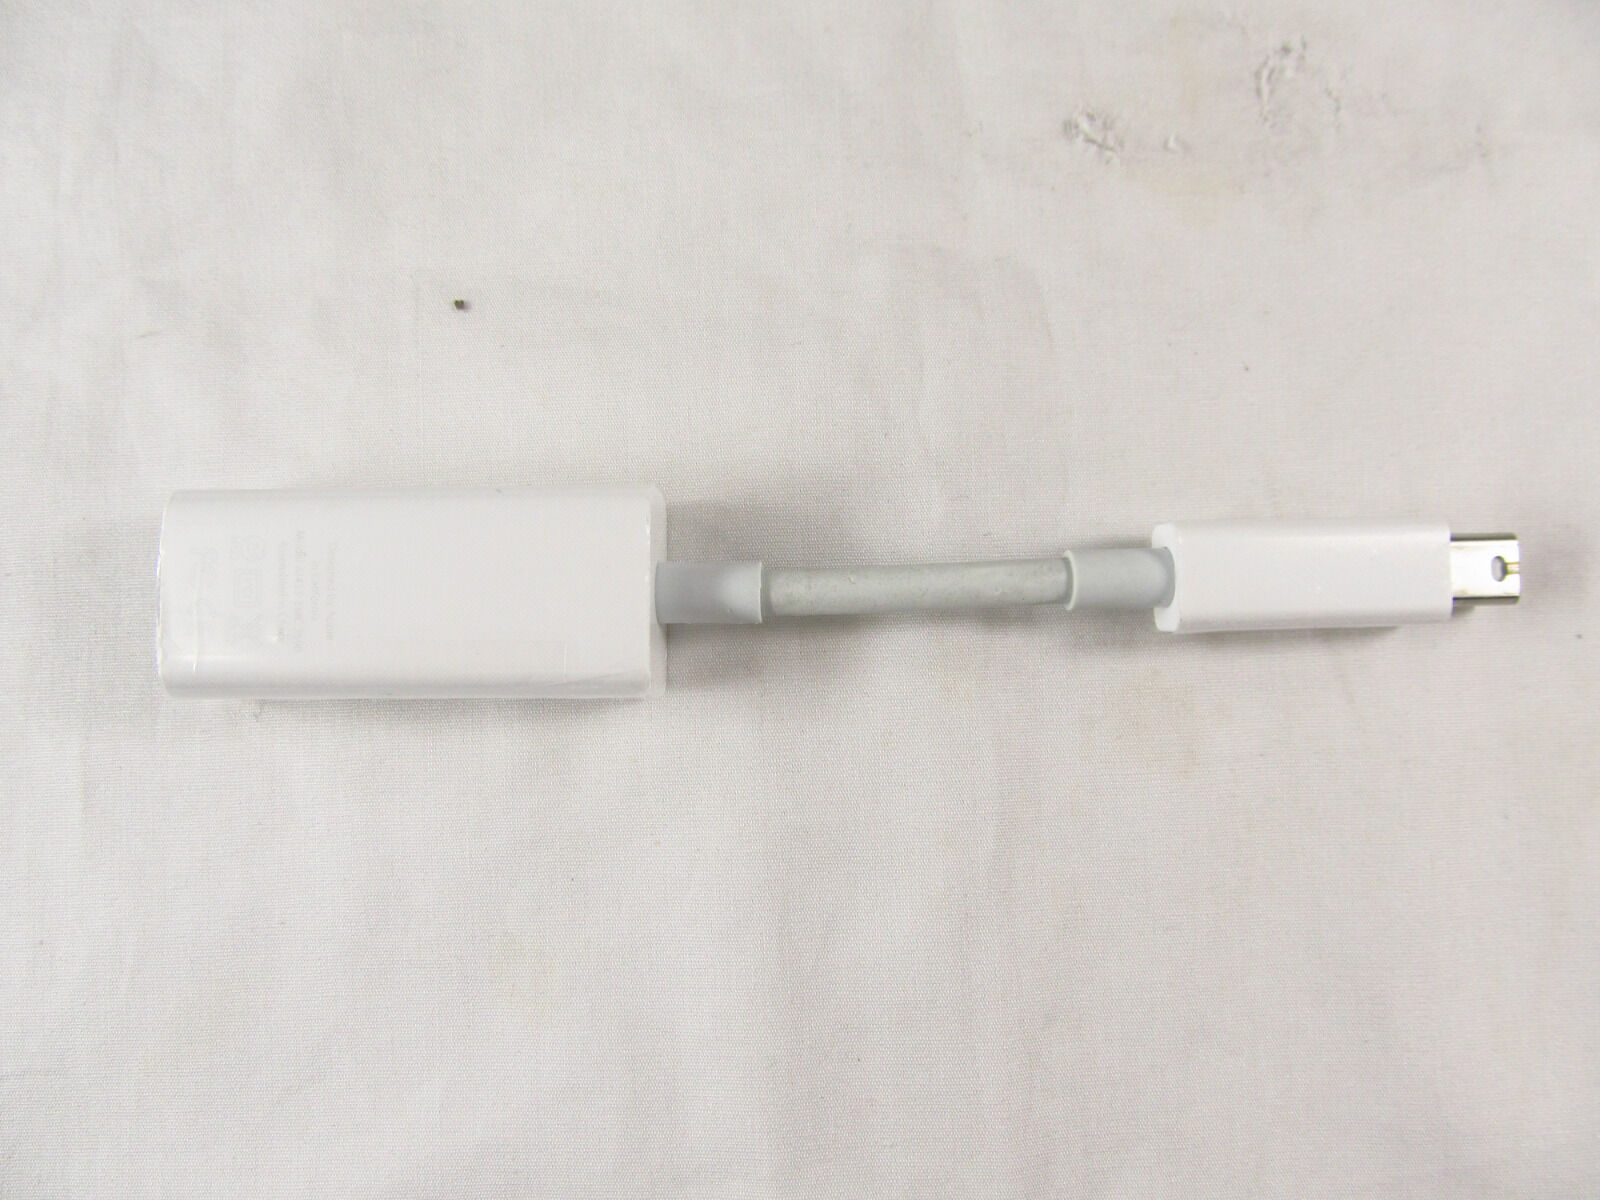 rj45 to thunderbolt 2003 dodge grand caravan wiring diagram original genuine apple a1433 gigabit